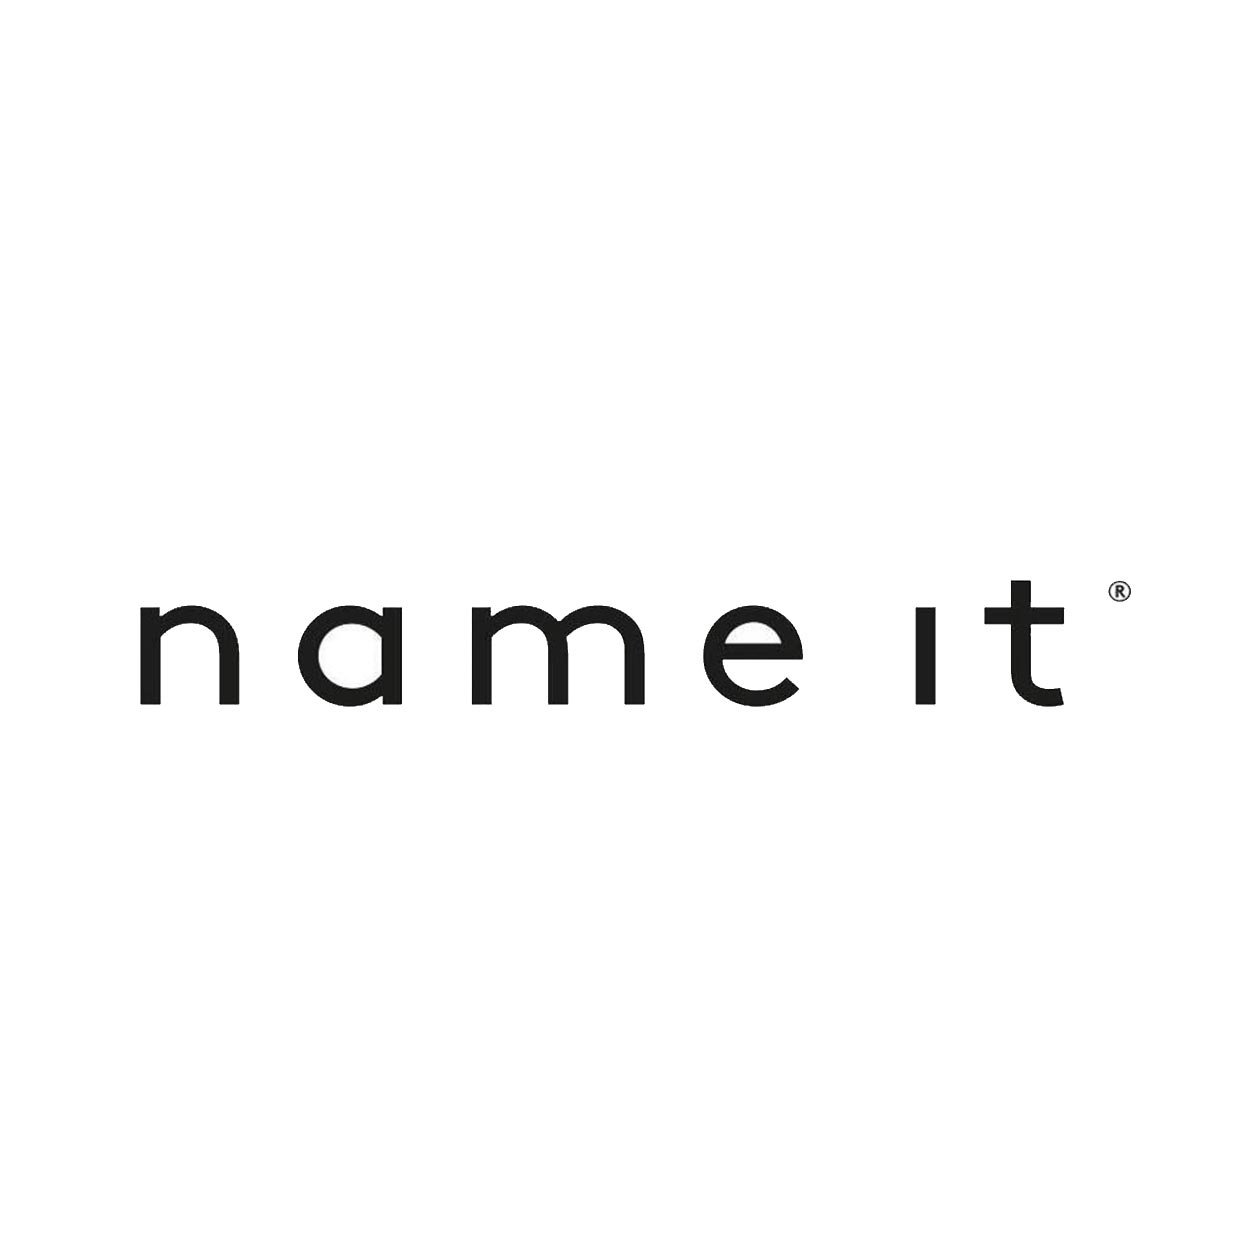 Logo name it